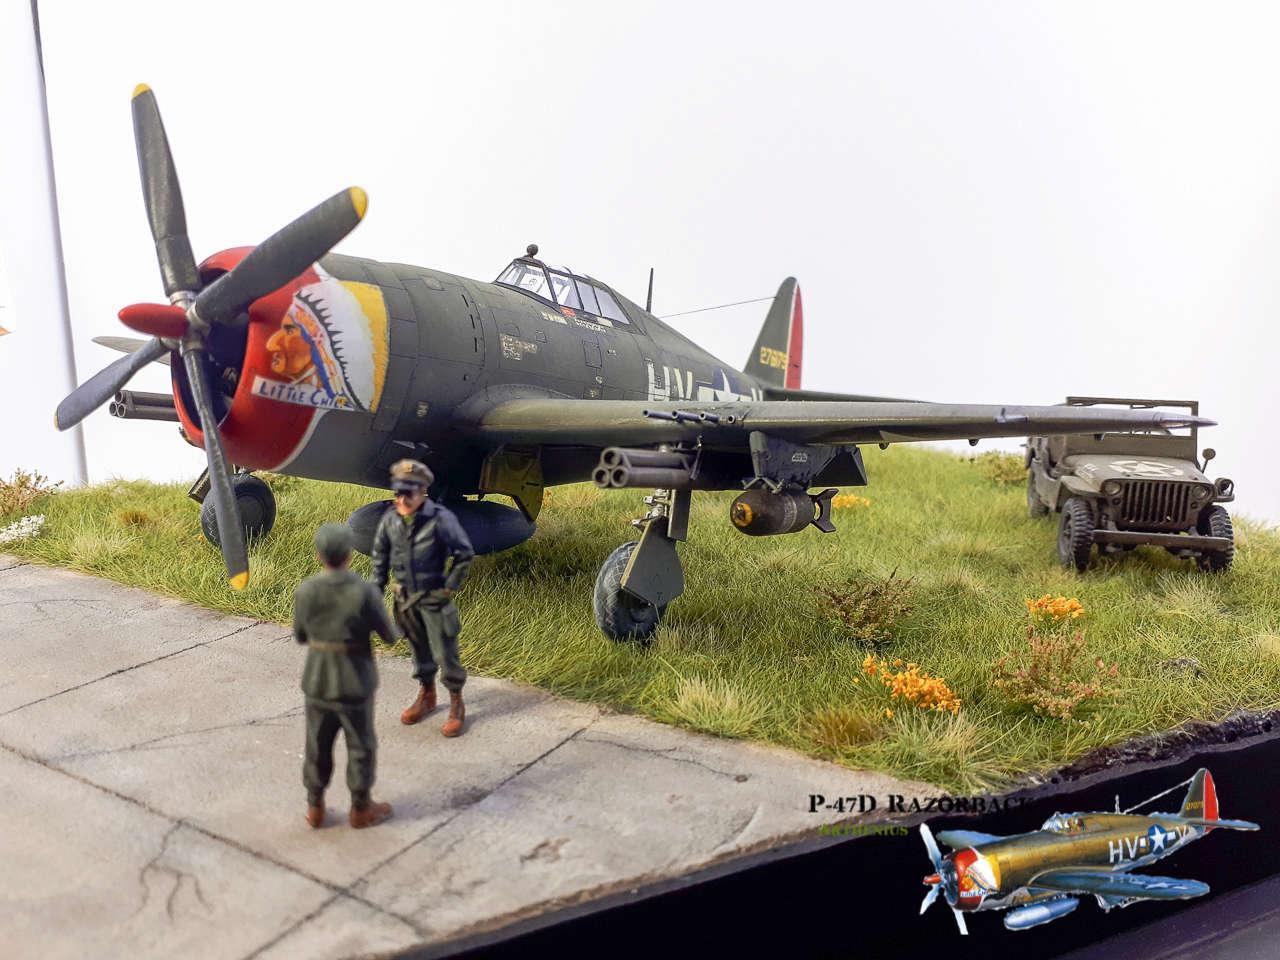 P-47D Razorback - Tamiya 1/48eme + PE Eduard - Page 5 2018-324